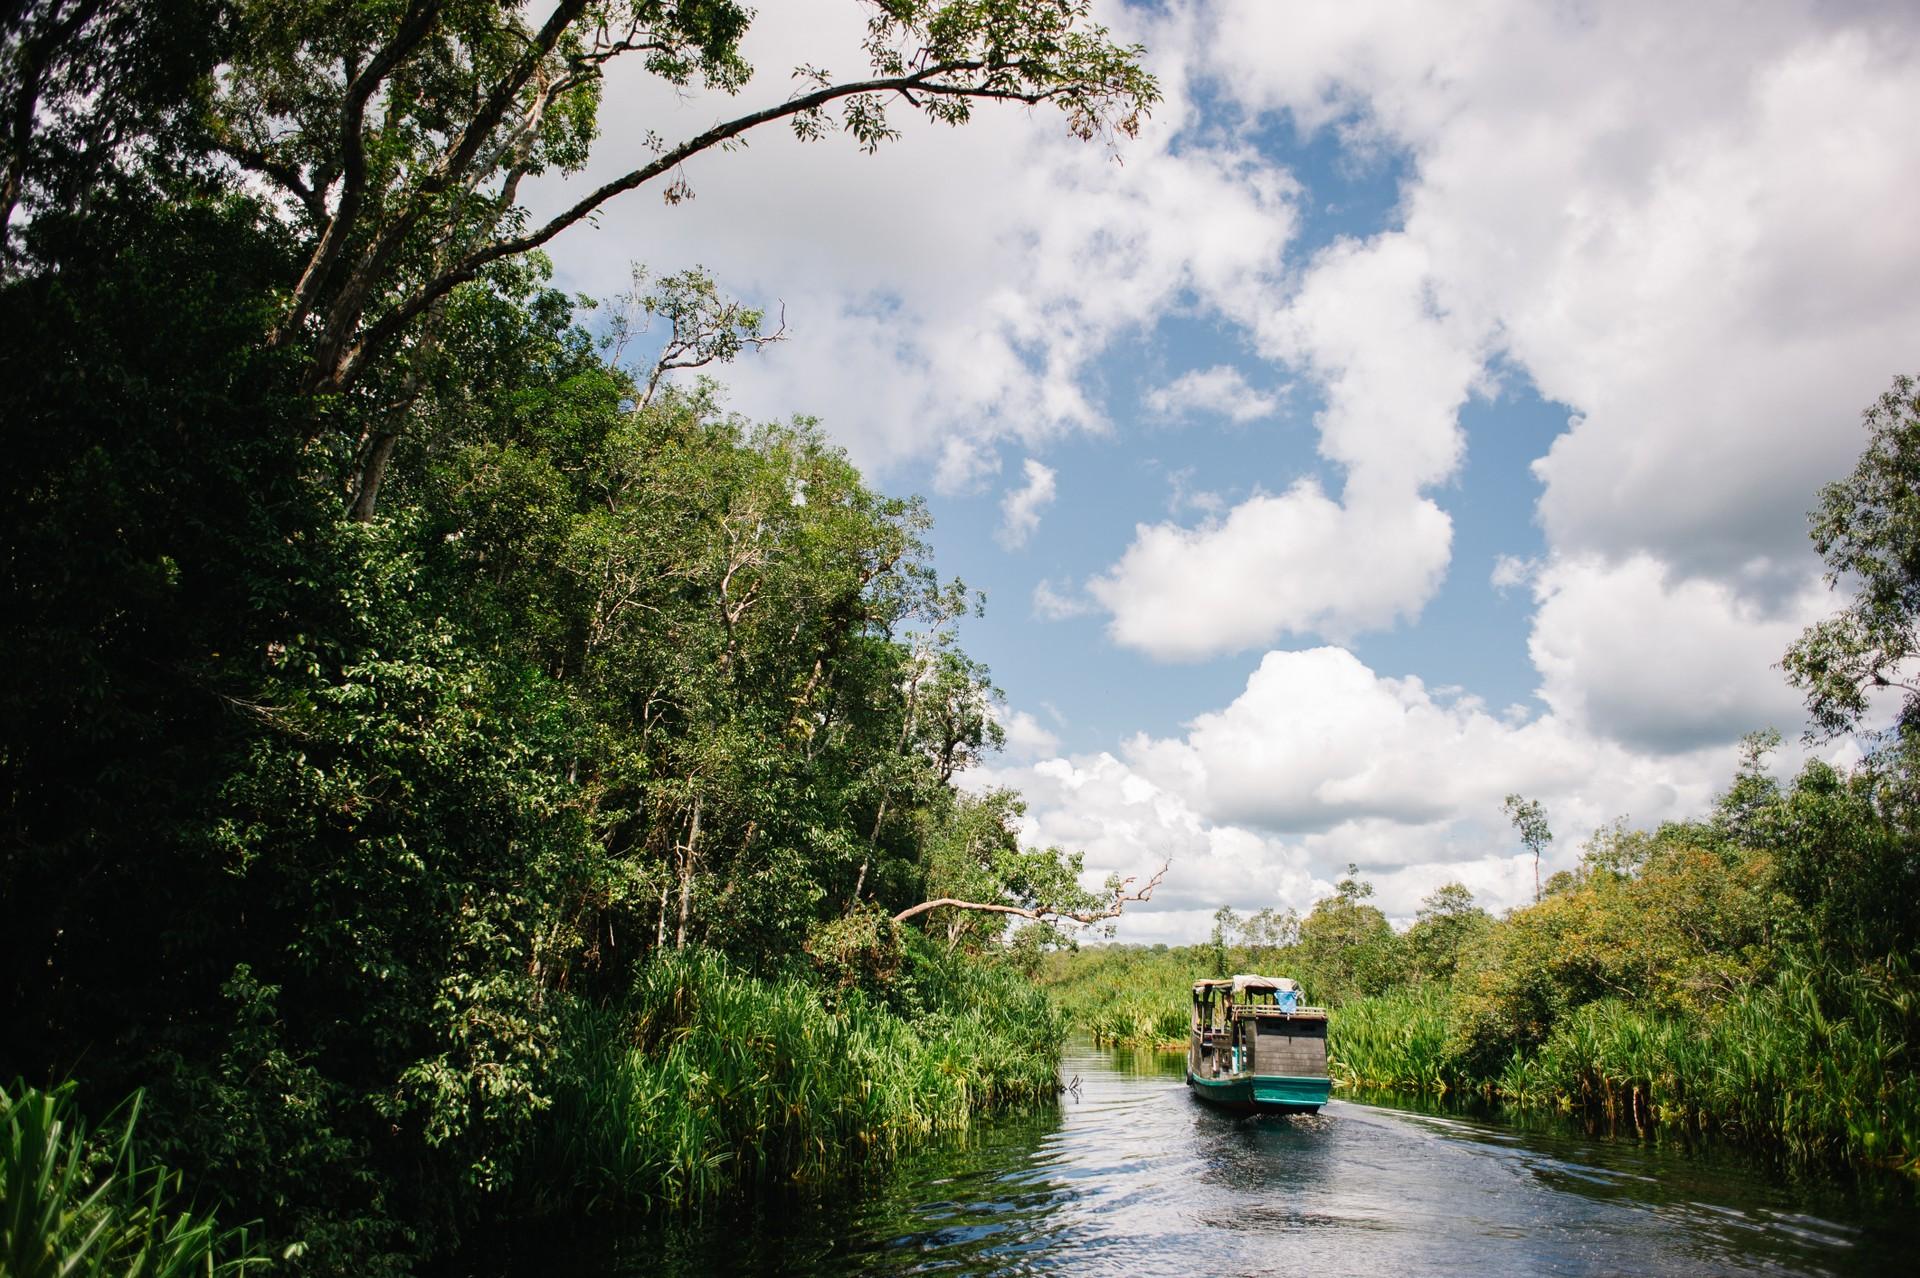 A klotok boat sails down the river in Tanjung Puting, Indonesia